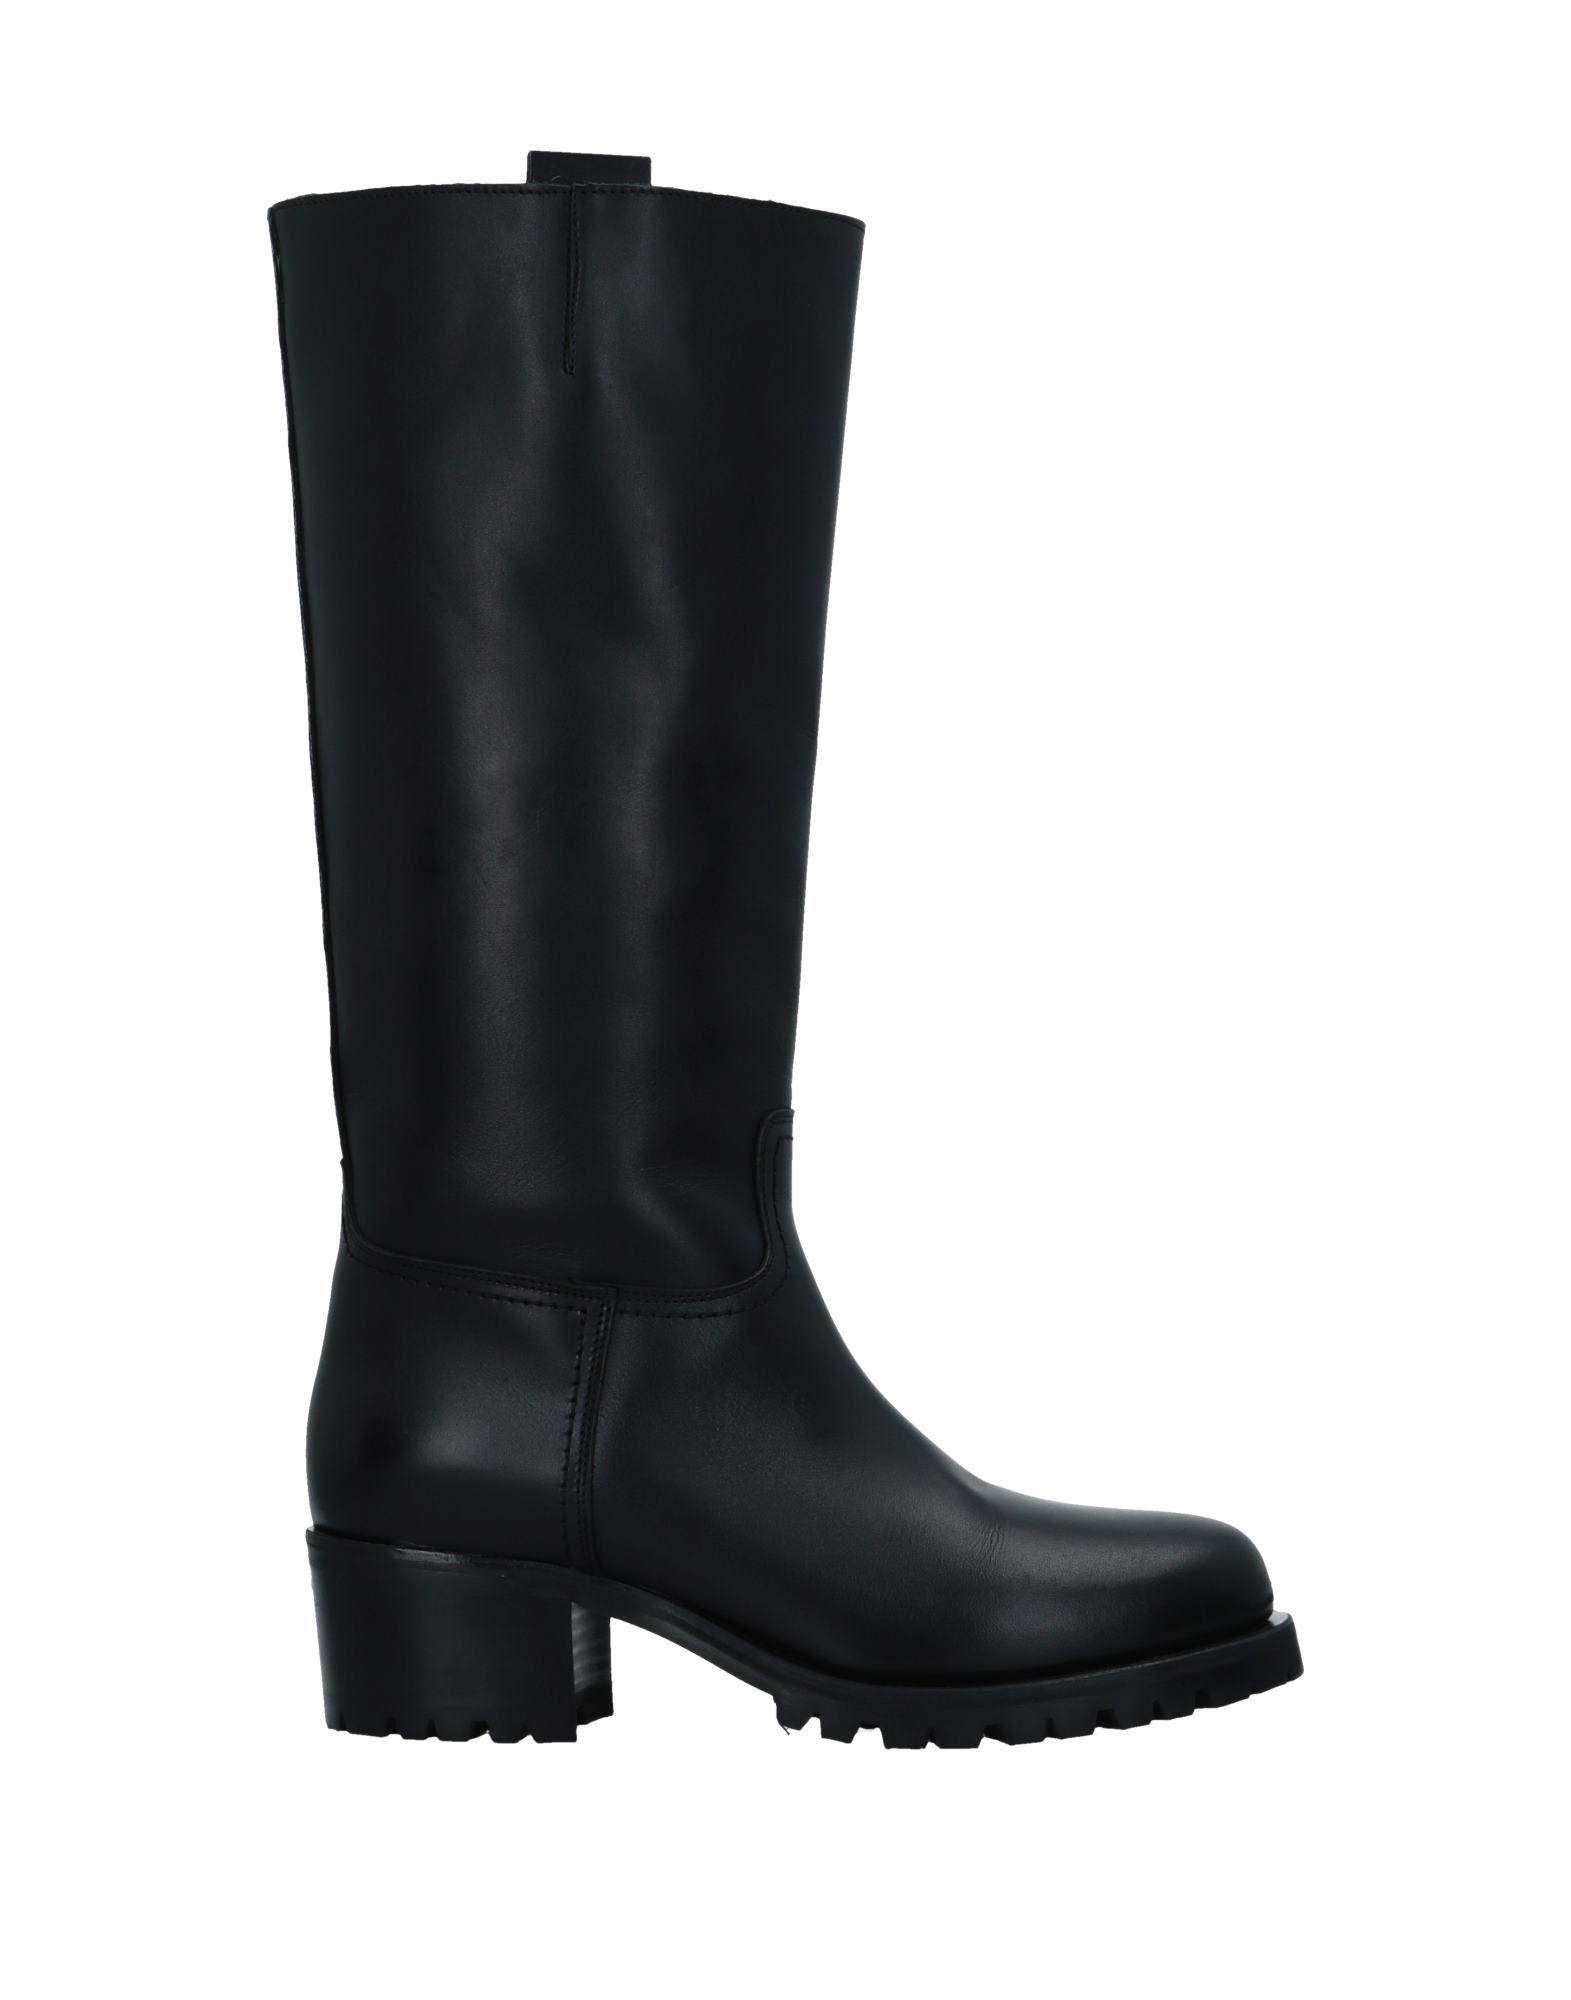 Rabatt Schuhe L' Autre Chose Stiefel Damen  11535923LJ